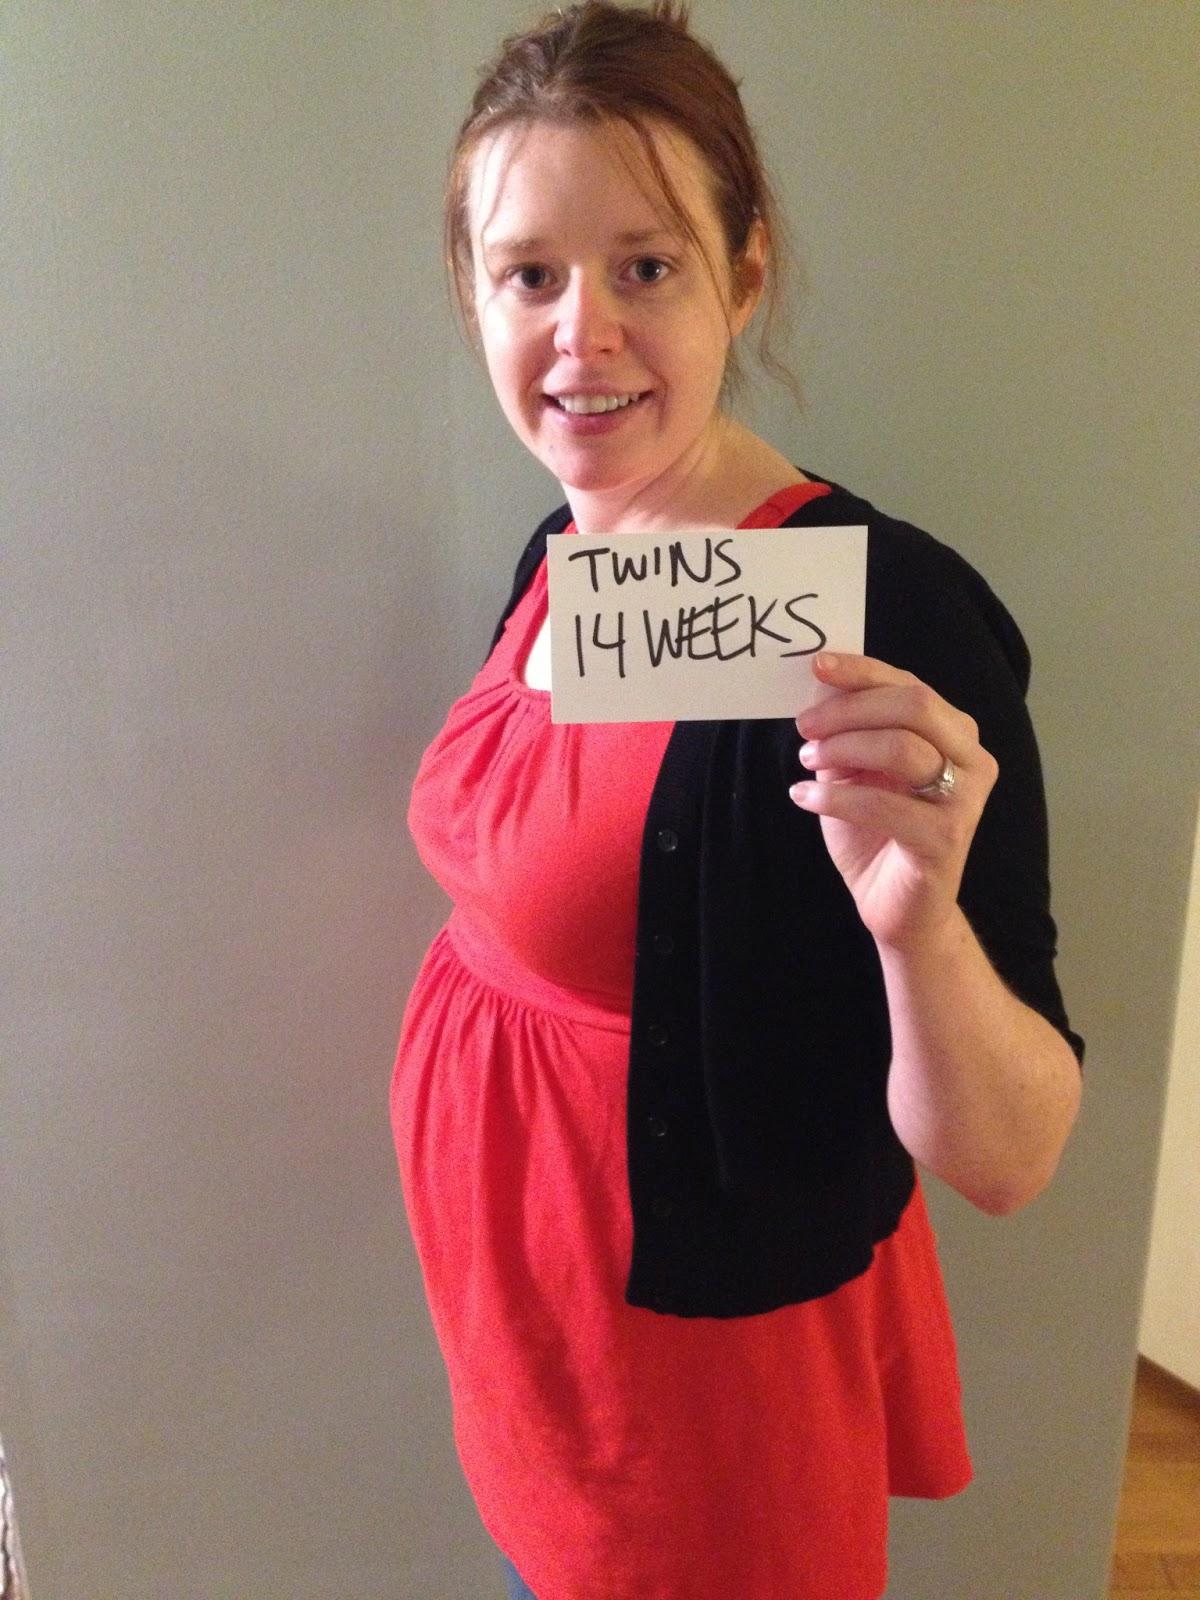 16 Weeks Pregnant Belly Twins 14 week twin belly